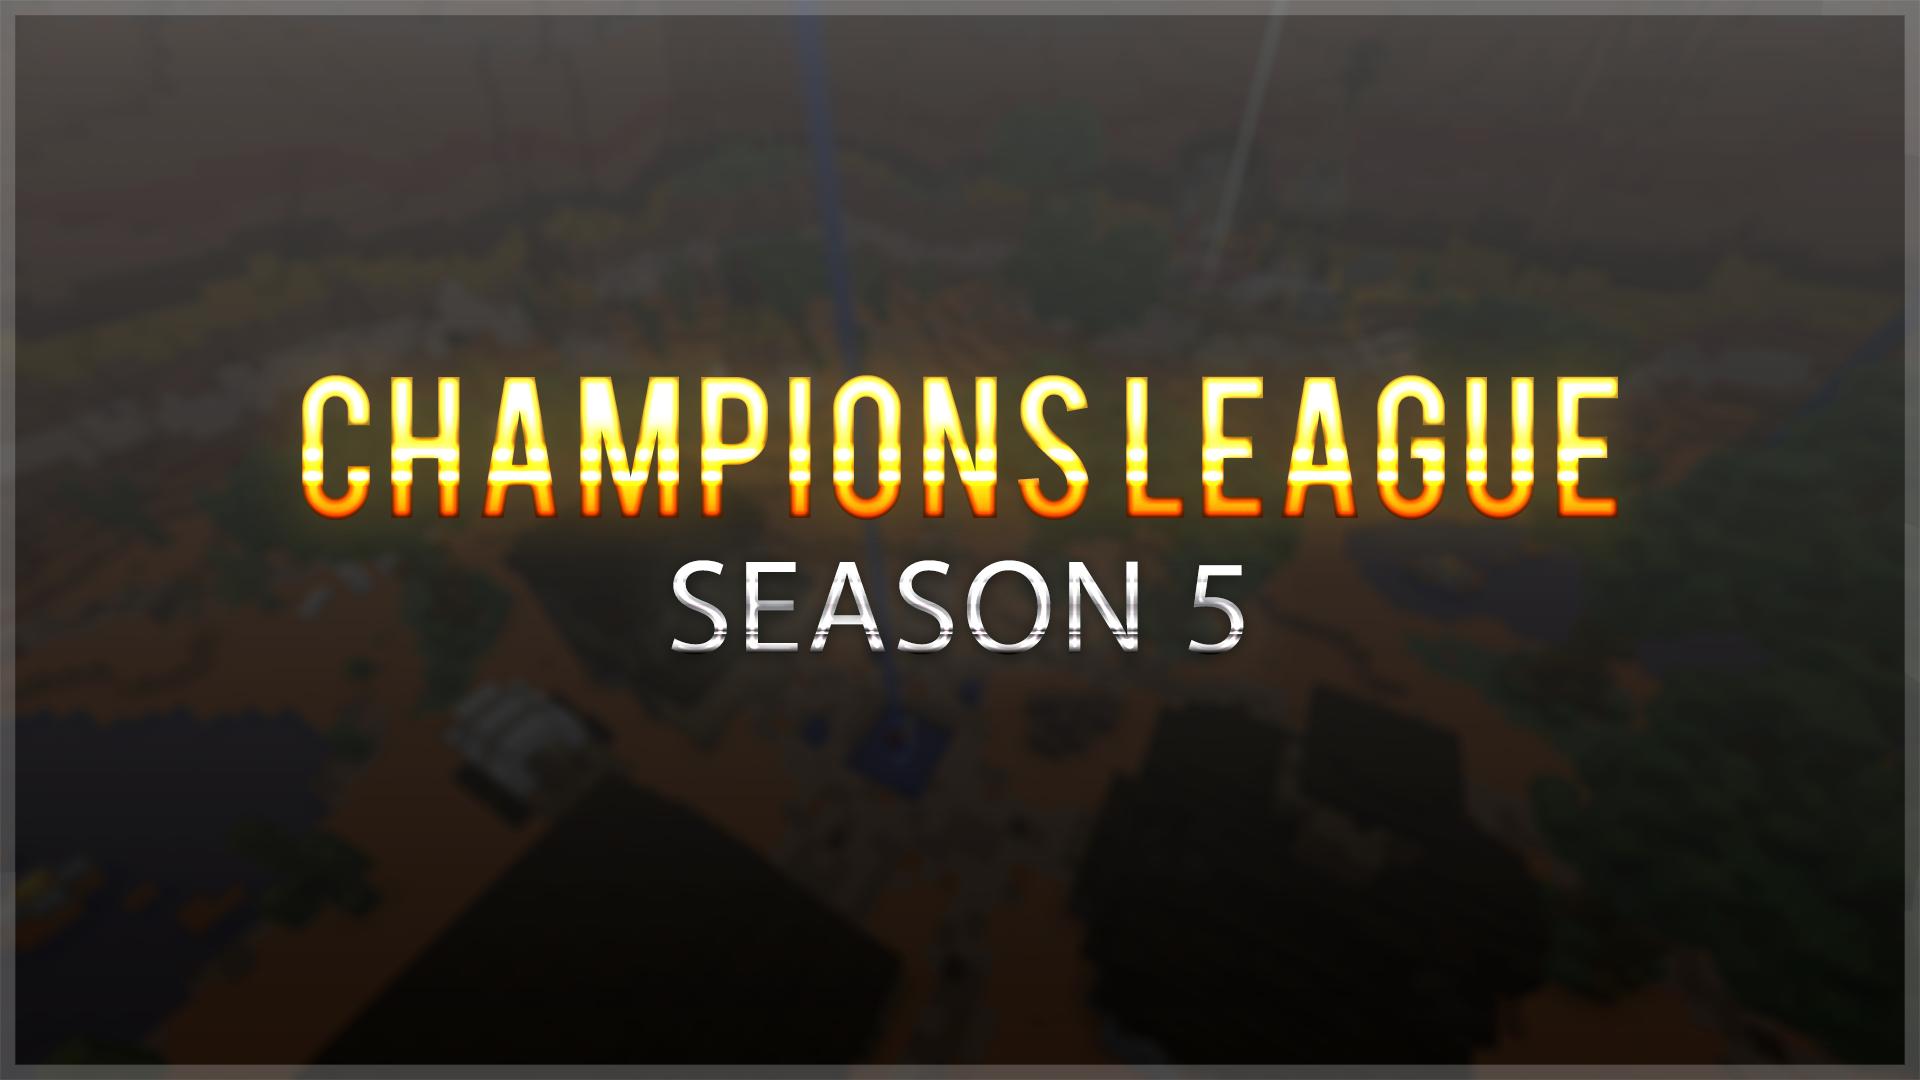 championsleagueseason5.png